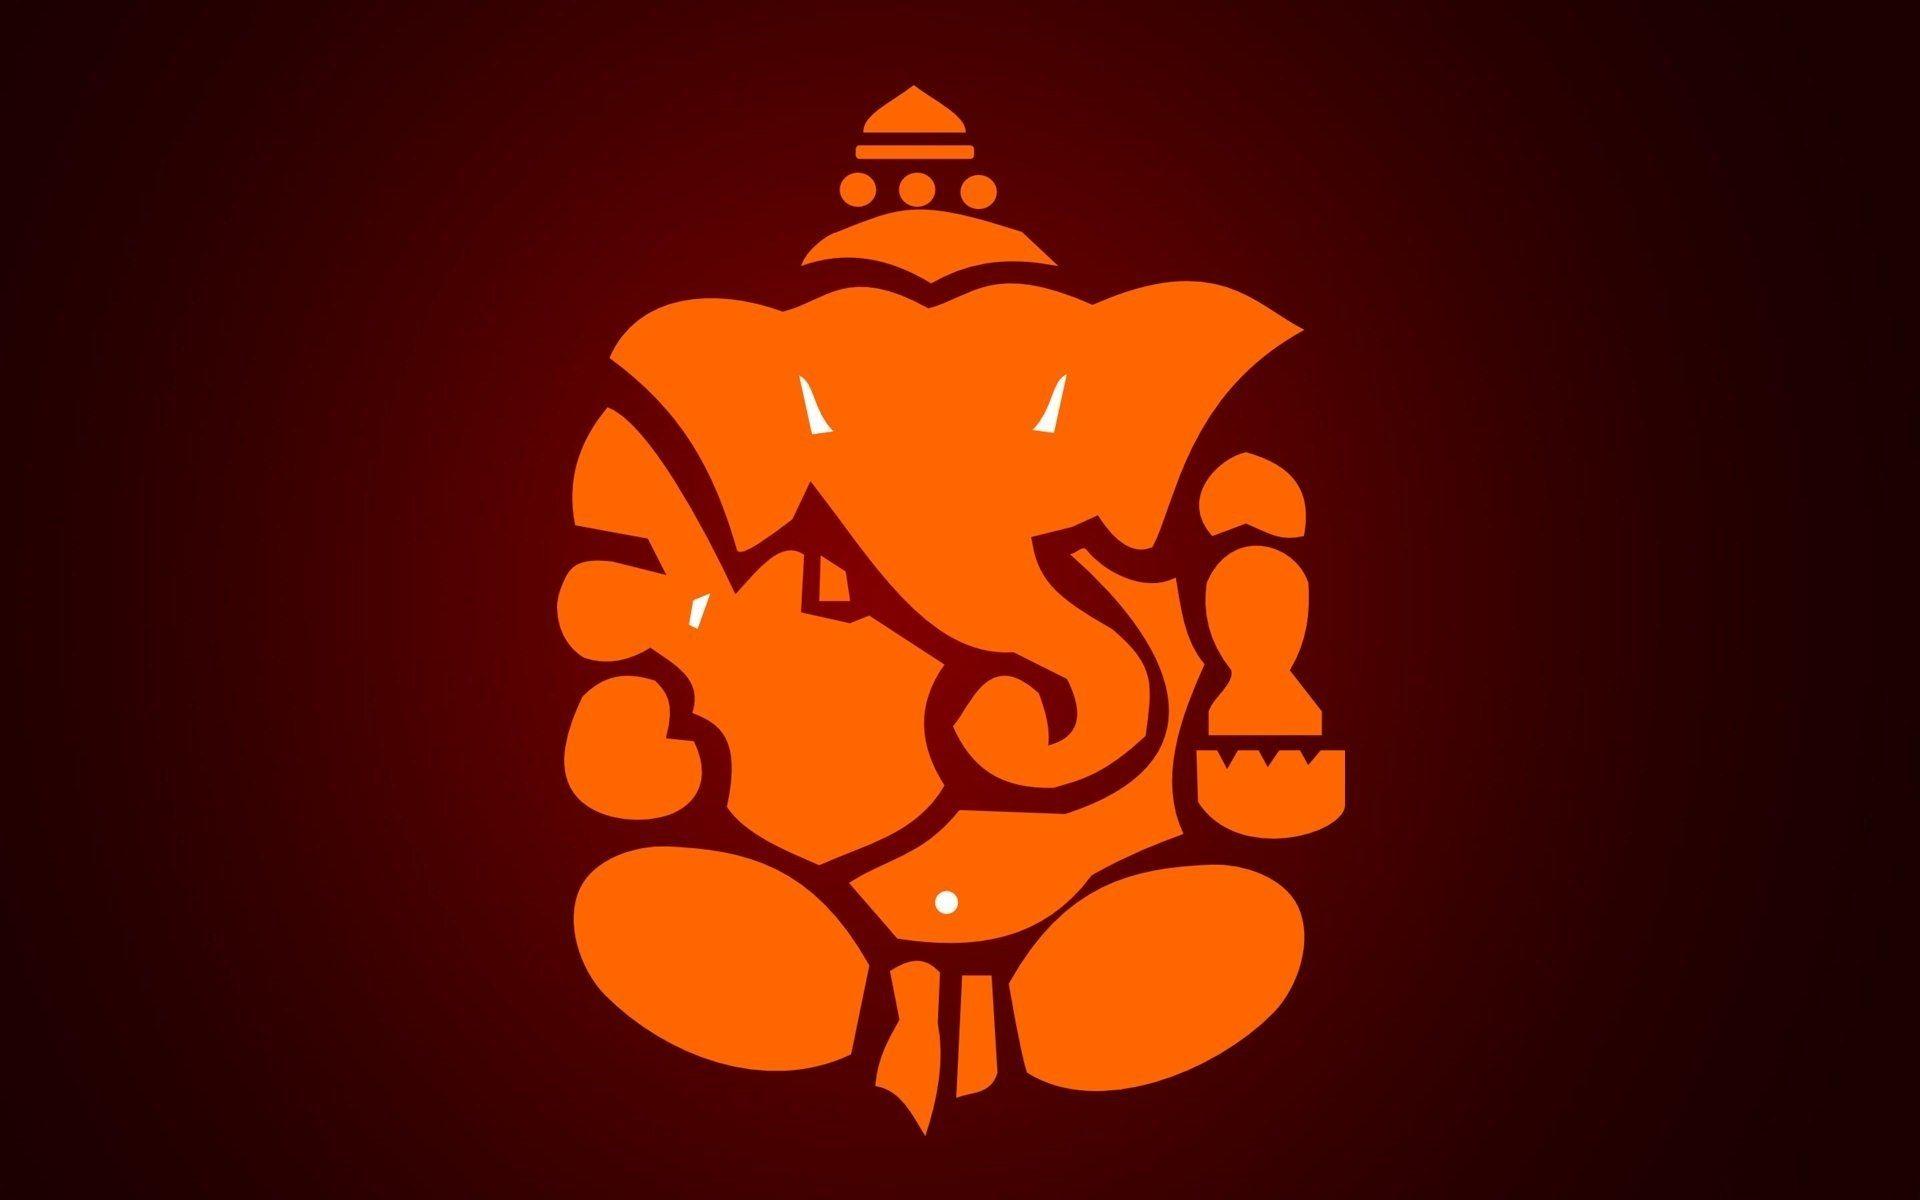 lord ganesha hd download wallpaper | god ganesh | pinterest